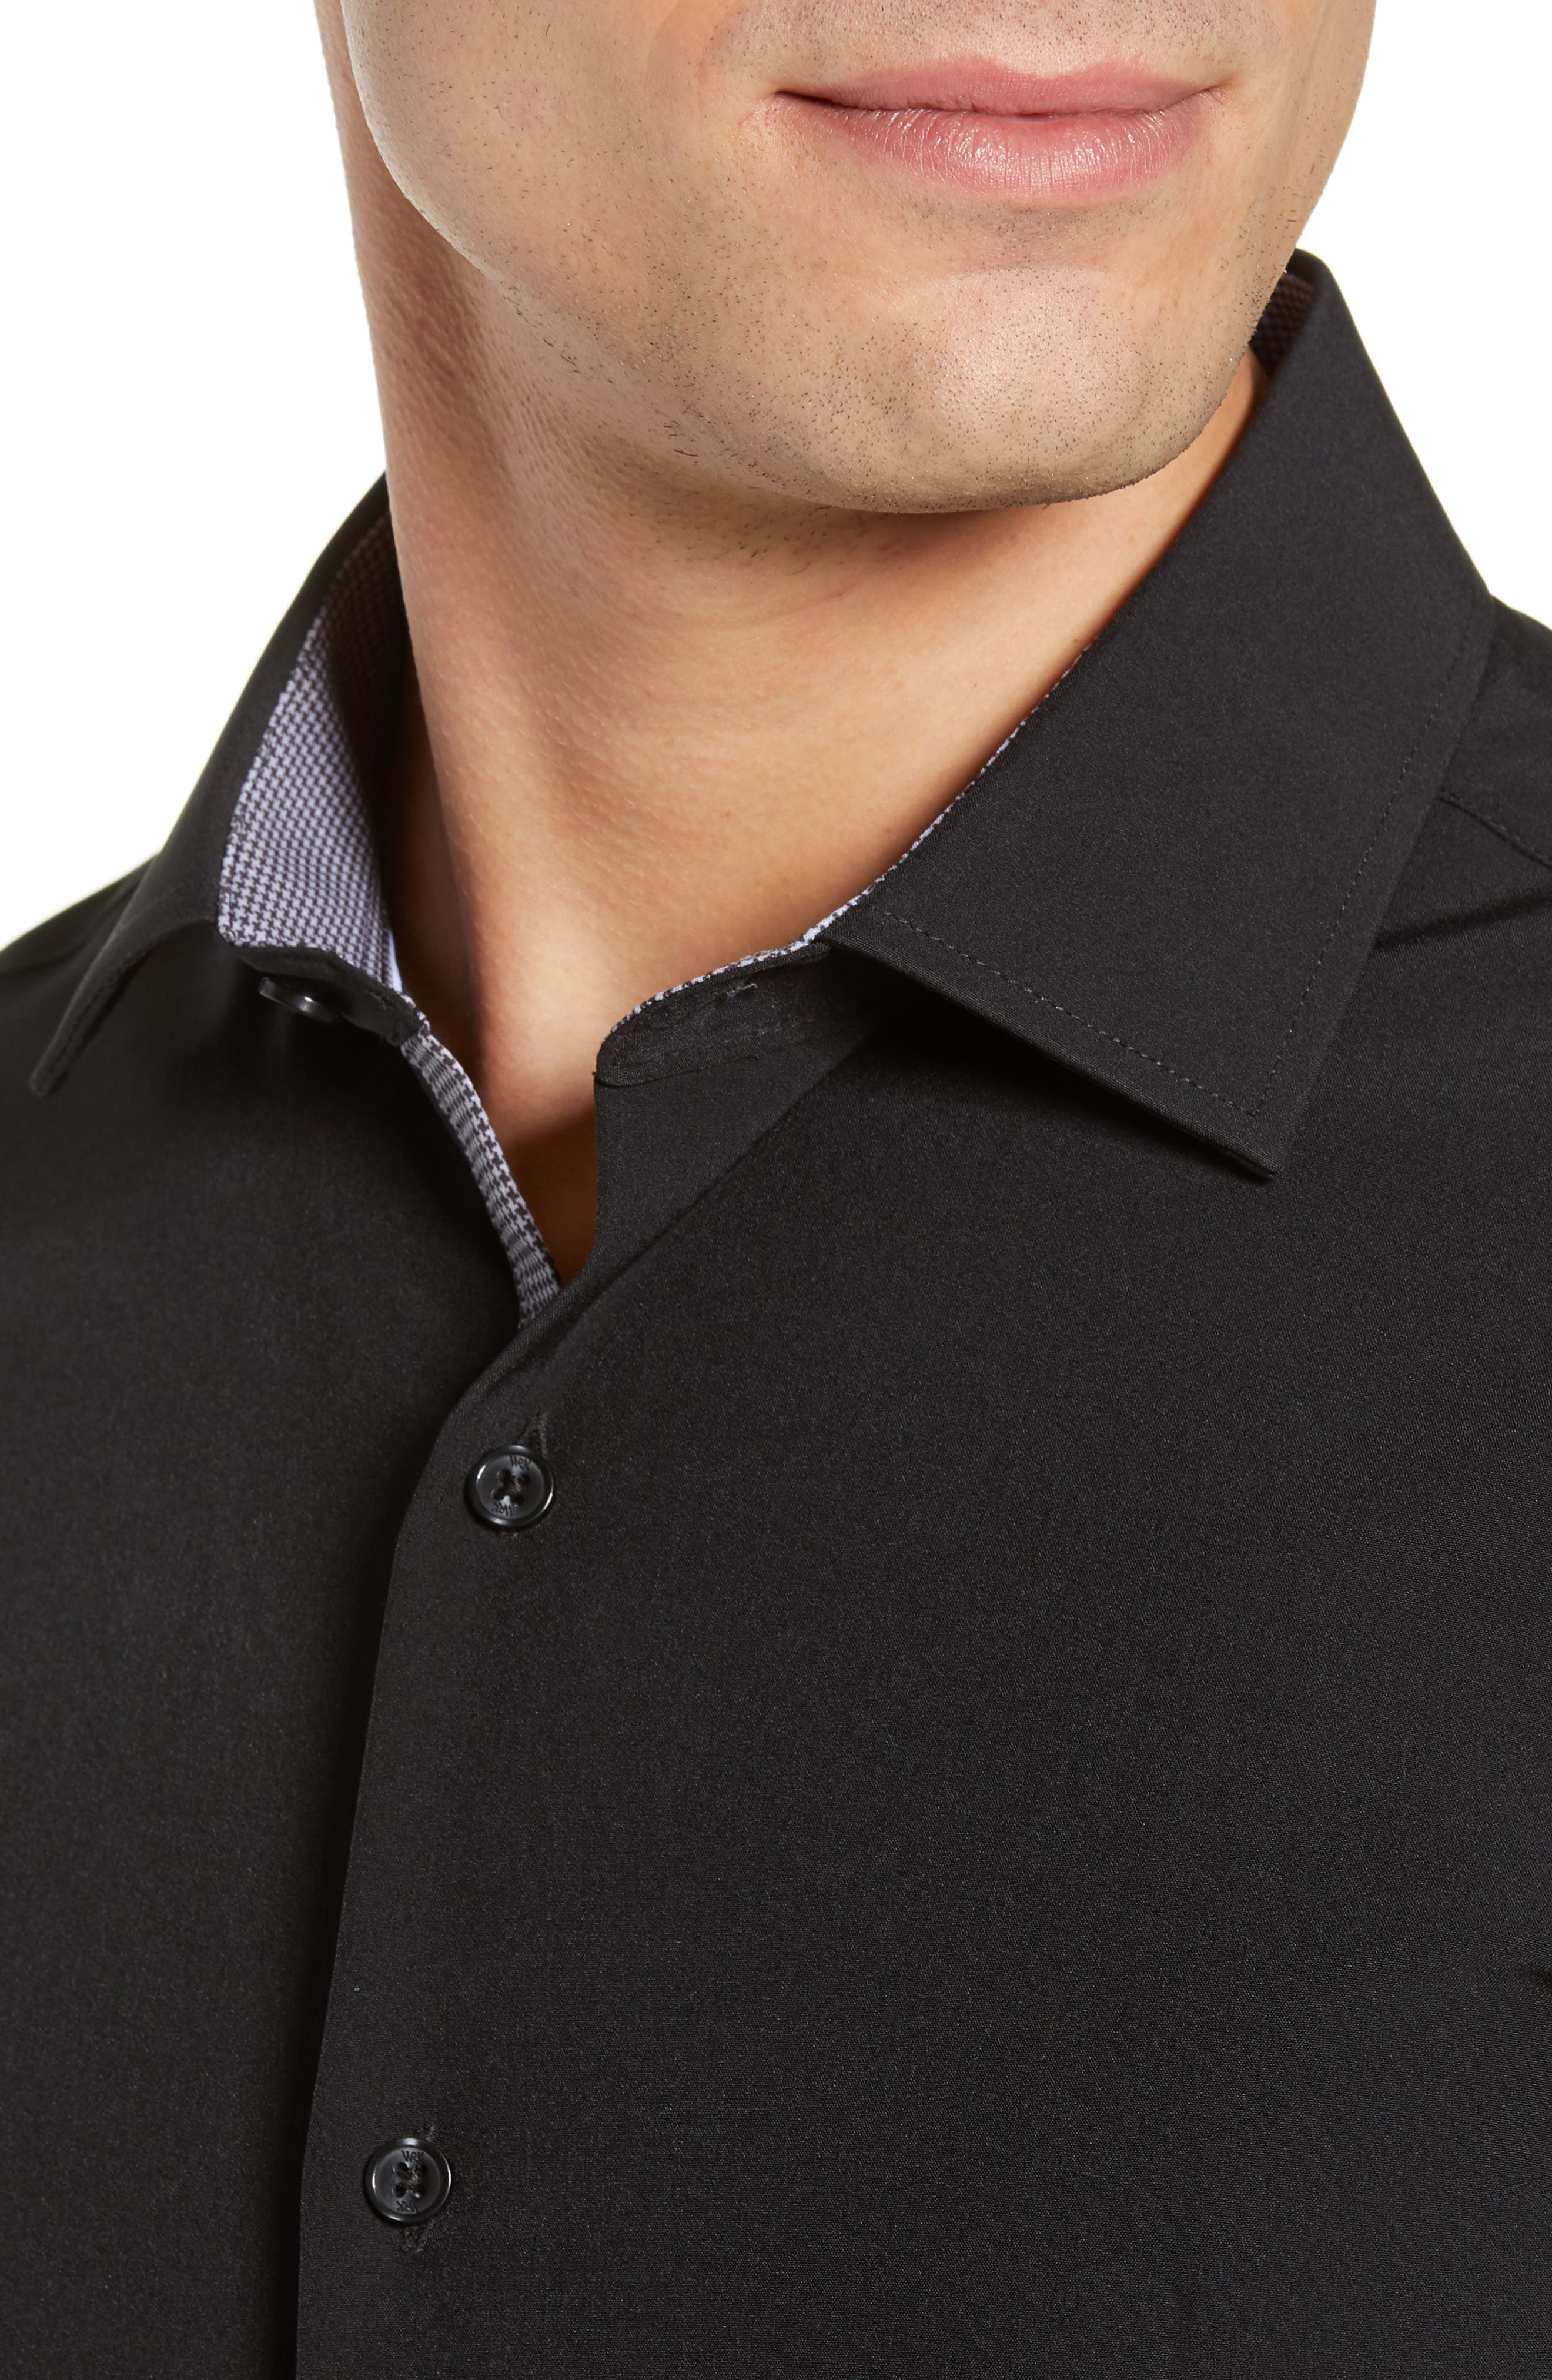 Trim Fit Stretch Solid Dress Shirt,                             Alternate thumbnail 2, color,                             BLACK